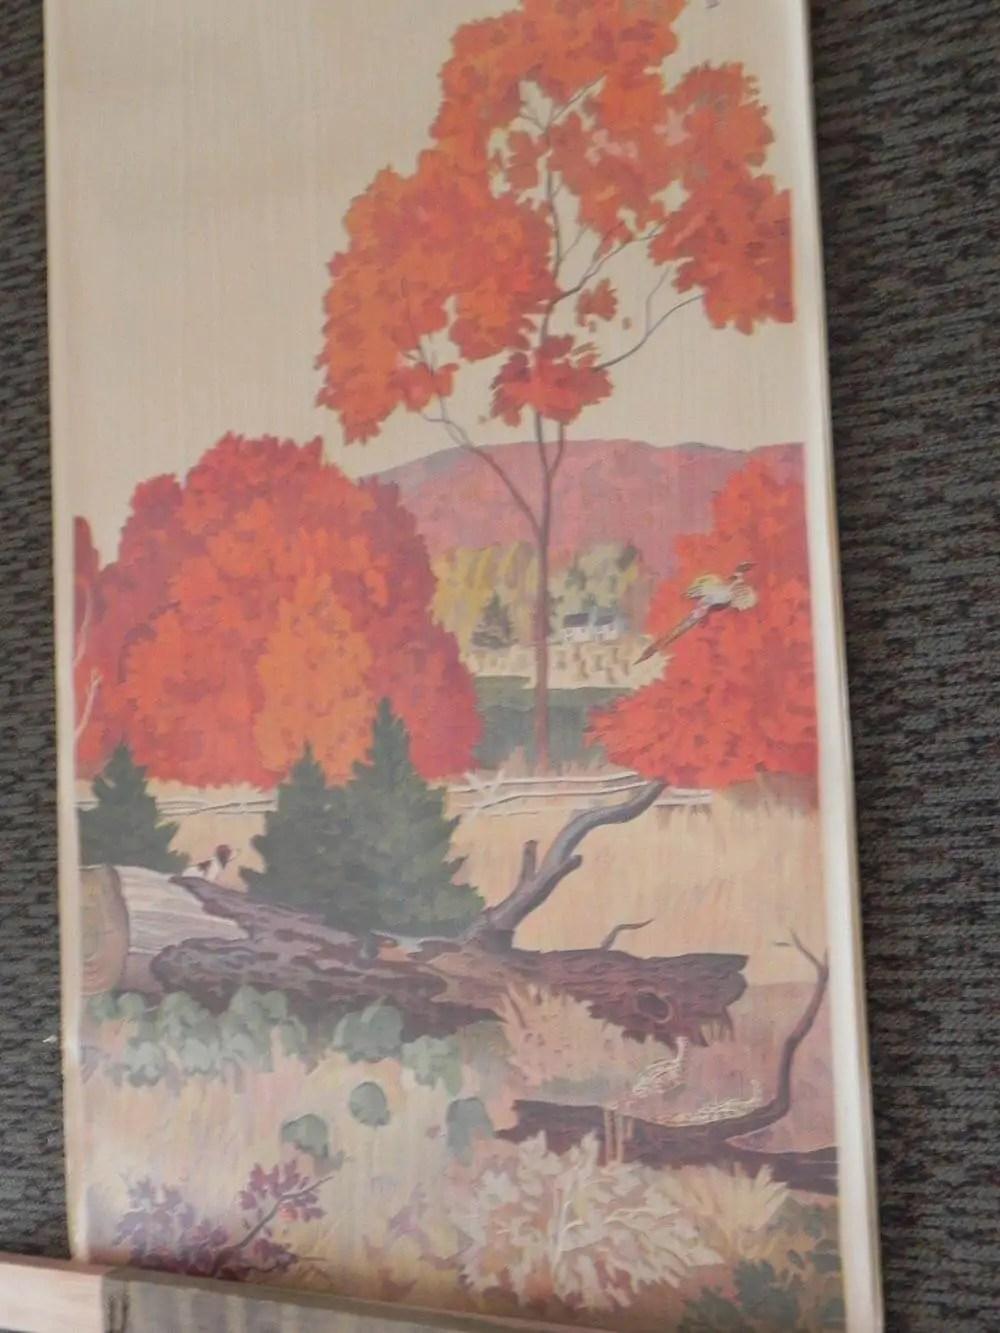 Fall Wallpaper Note Full Room Vintage Wallpaper Murals By The Schmitz Horning